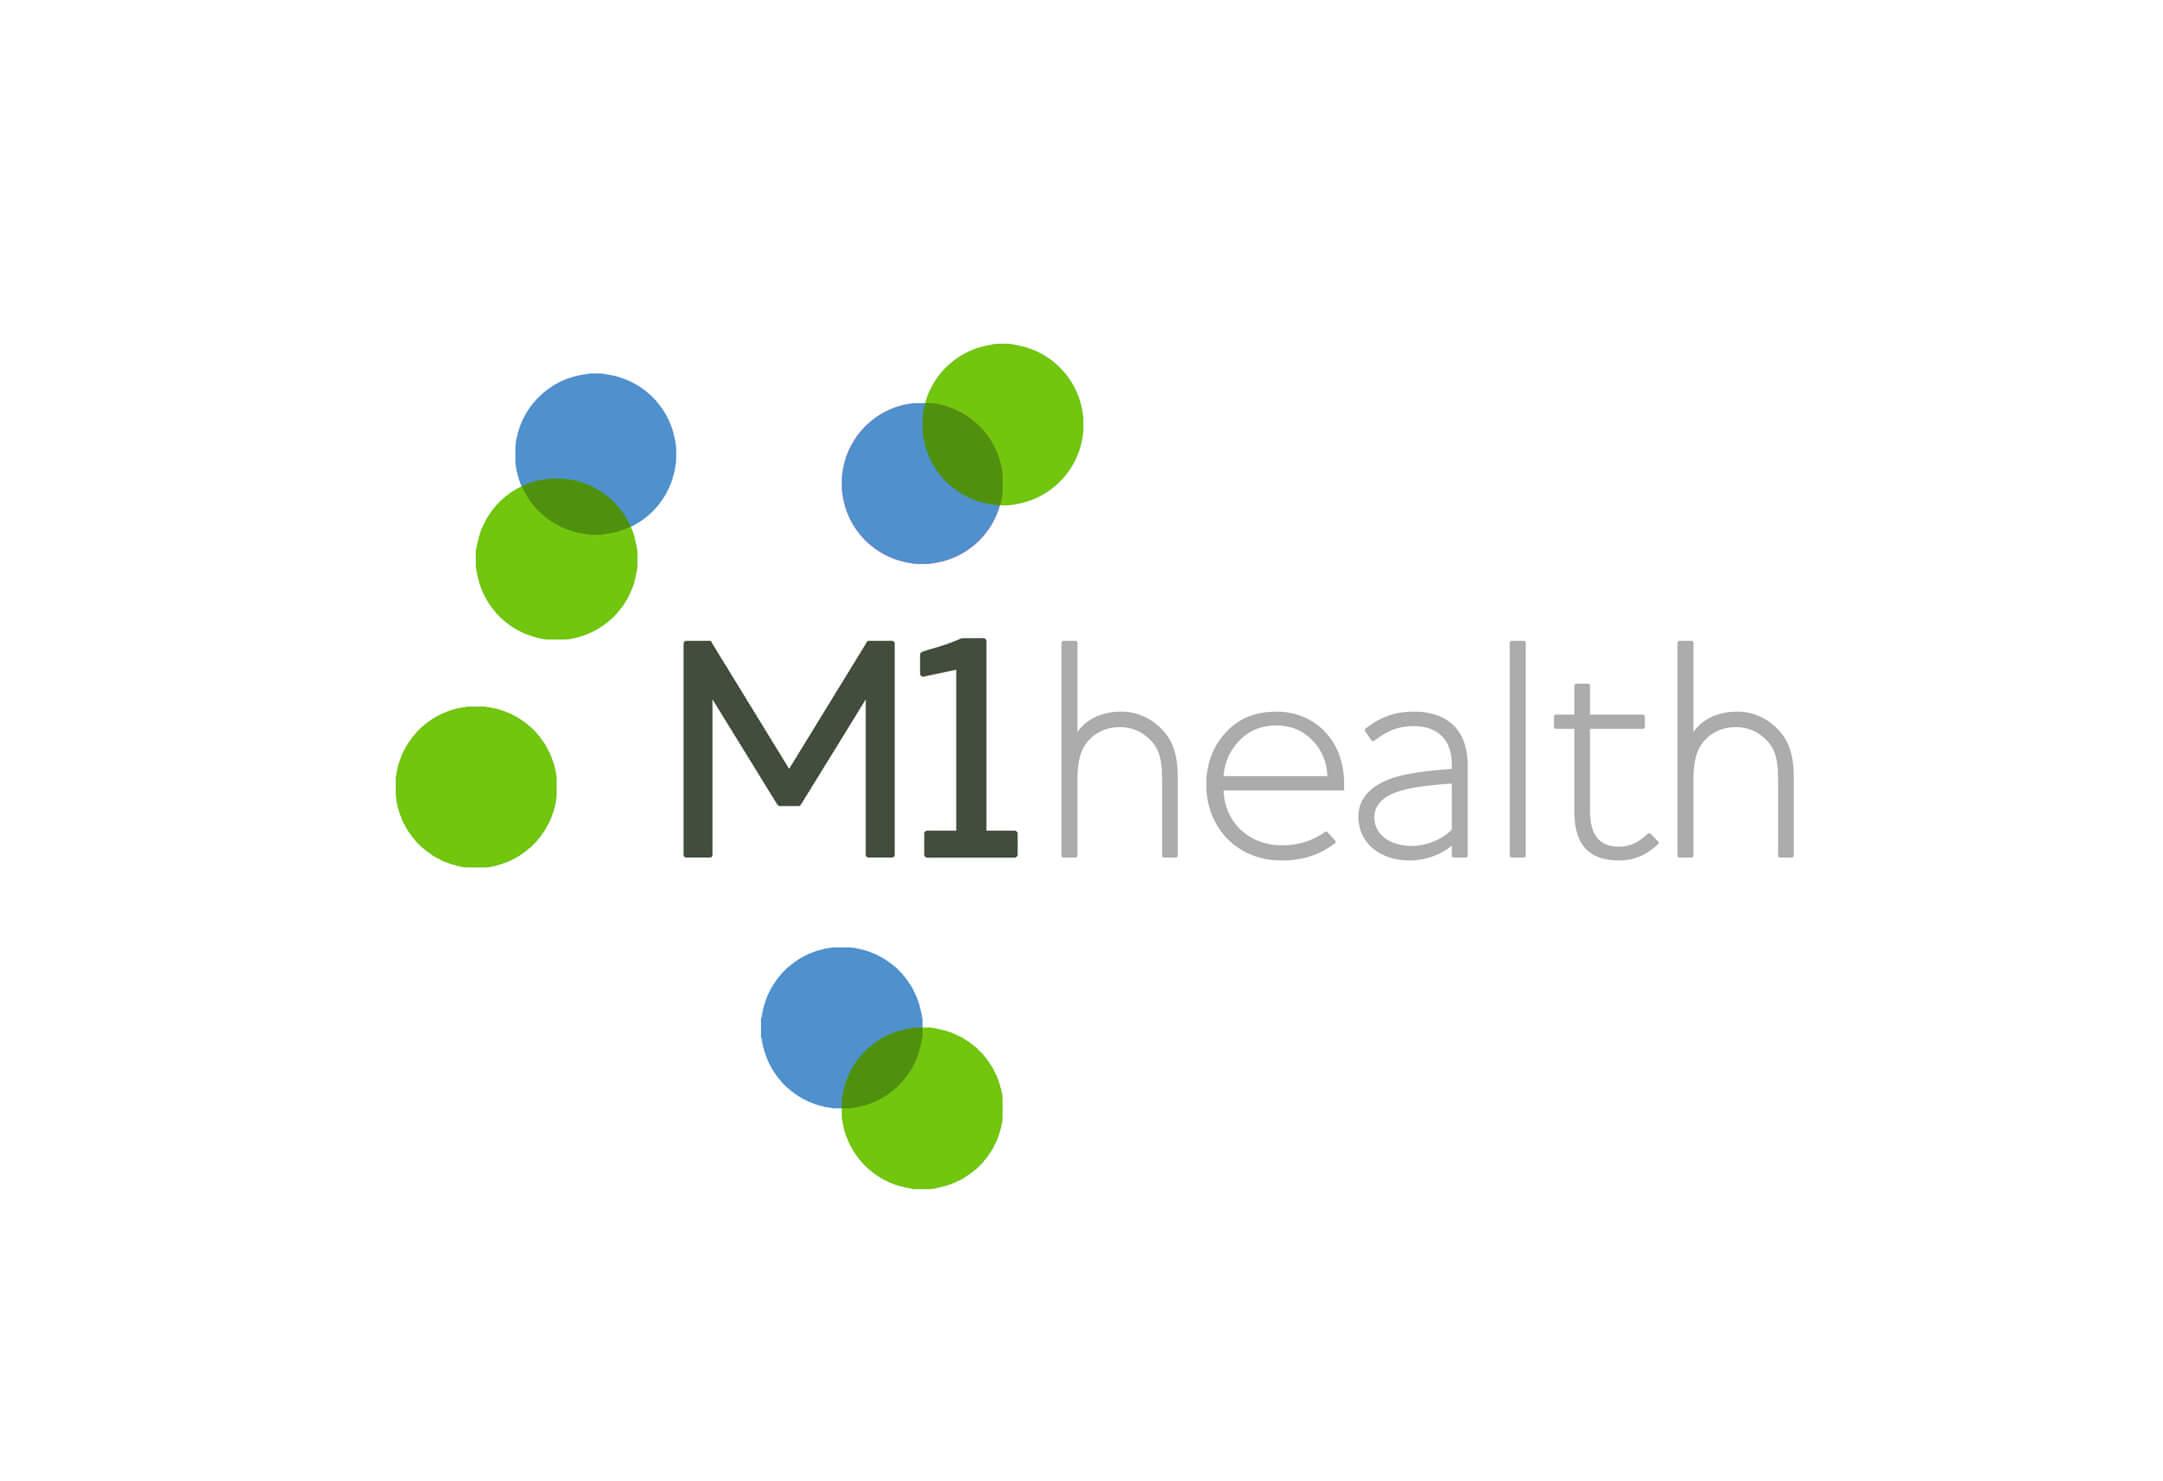 m1 health